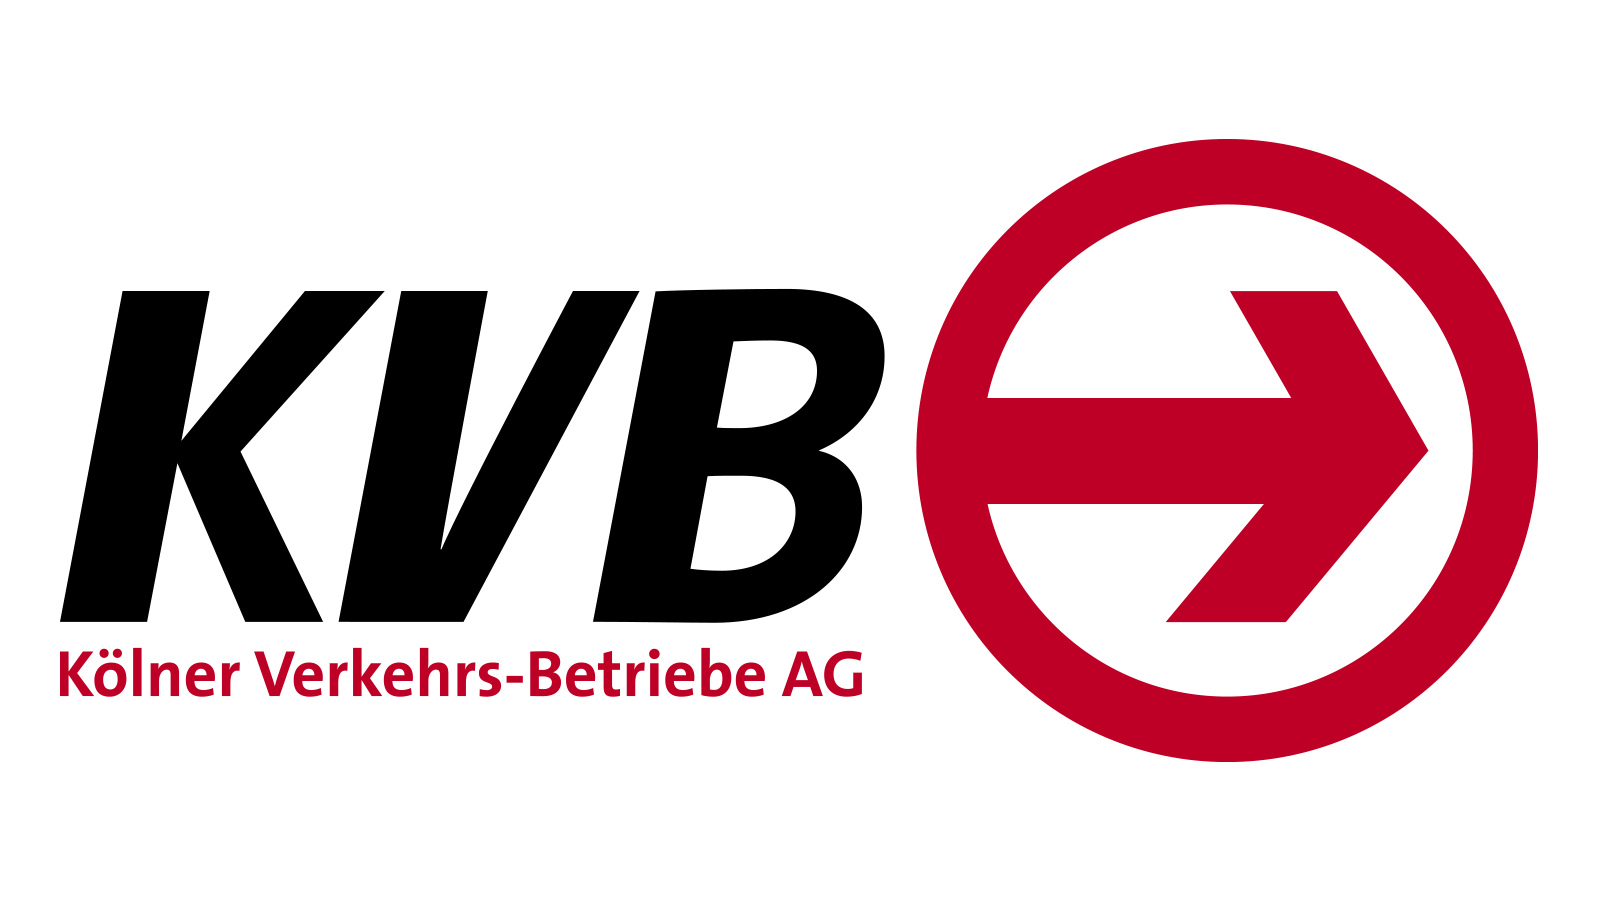 Logo Kölner Verkehrs-Betriebe